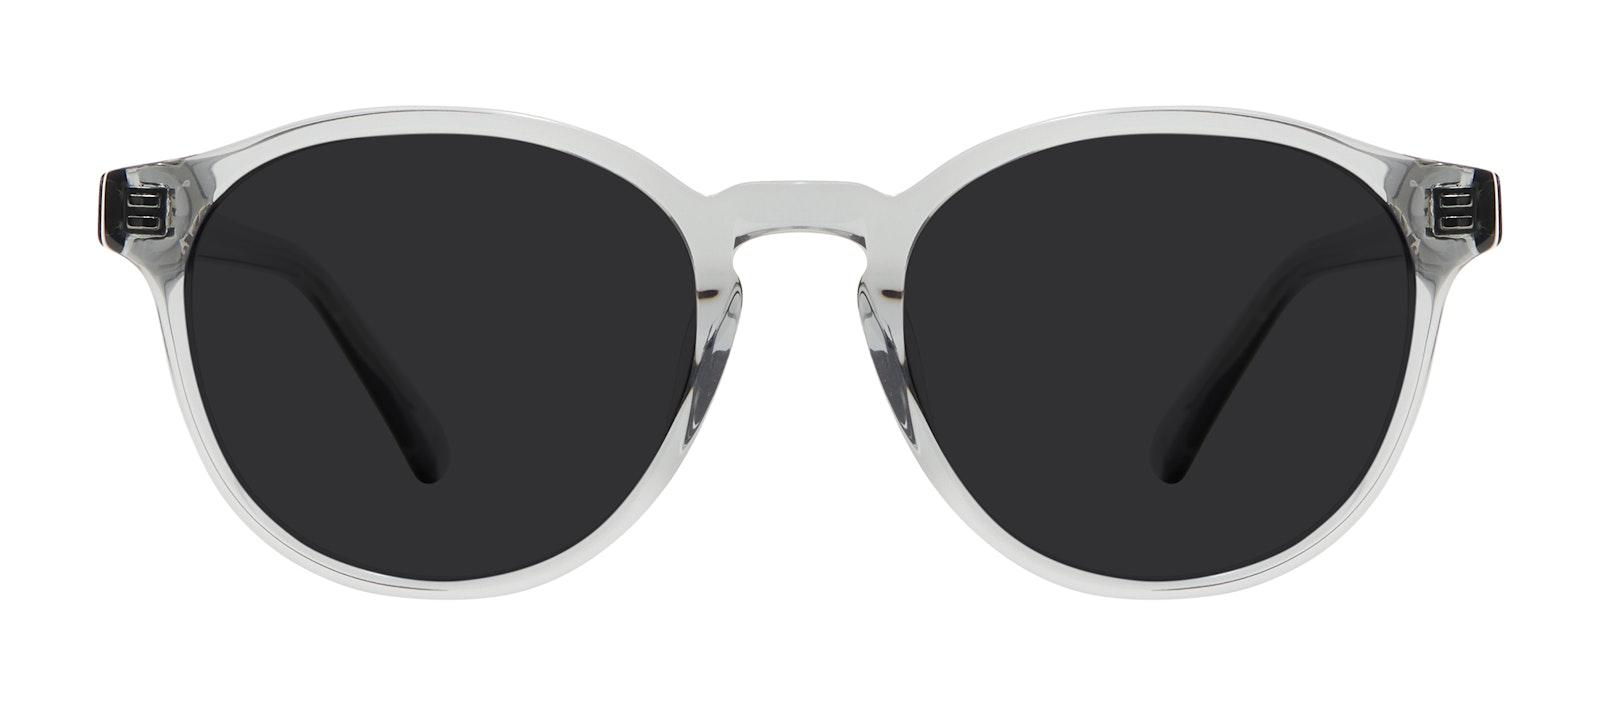 Affordable Fashion Glasses Round Sunglasses Men Aussie Storm Front